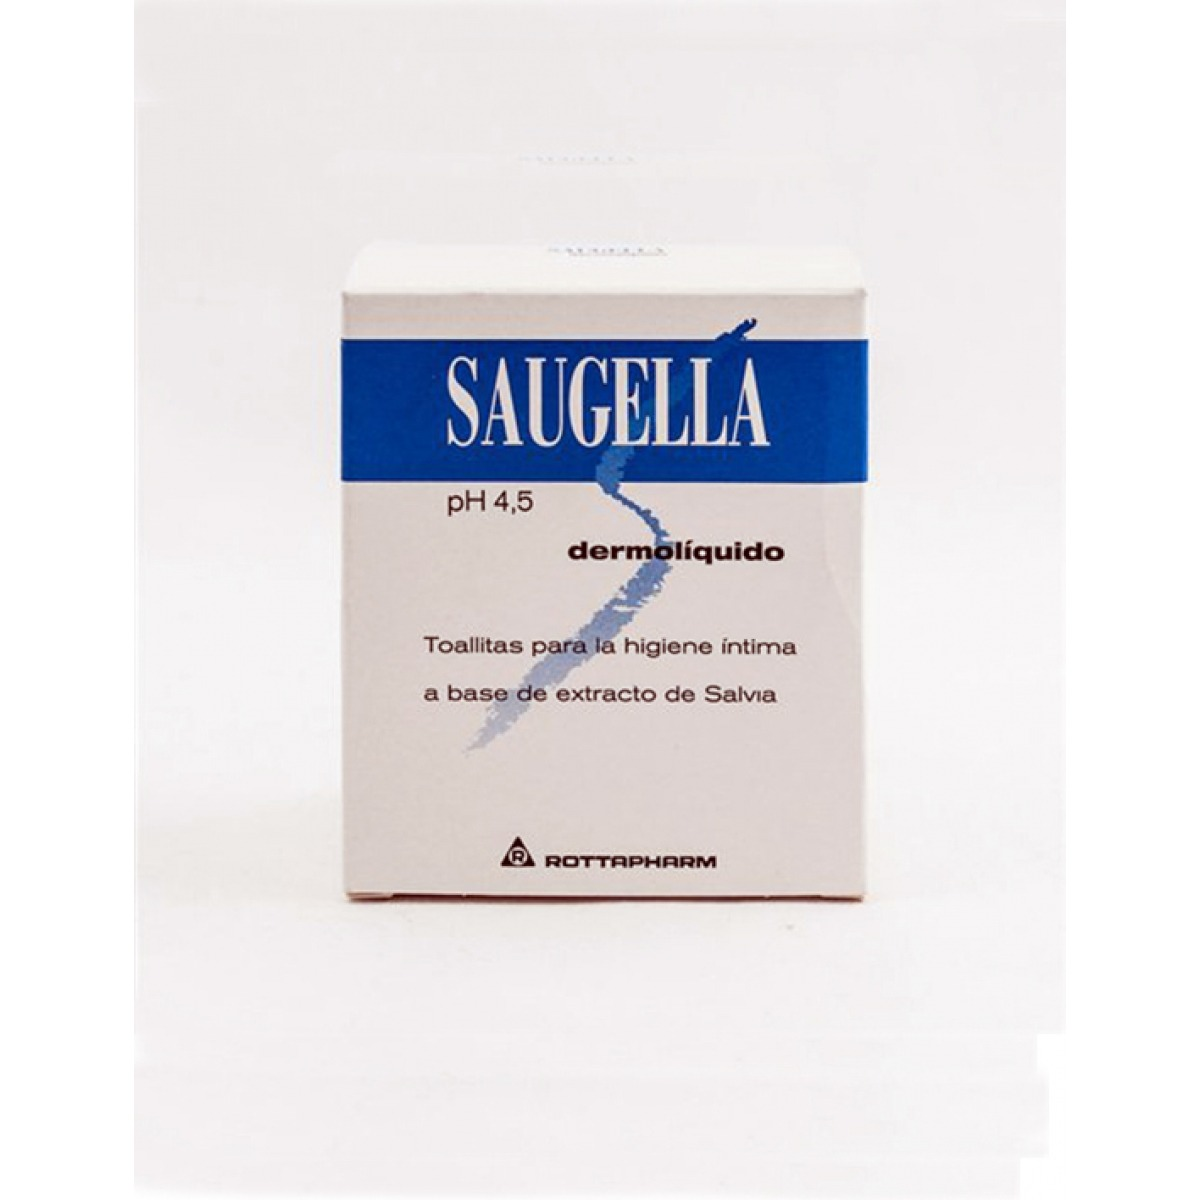 SAUGELLA DERMOLIQUIDO 10 TOALLITAS.